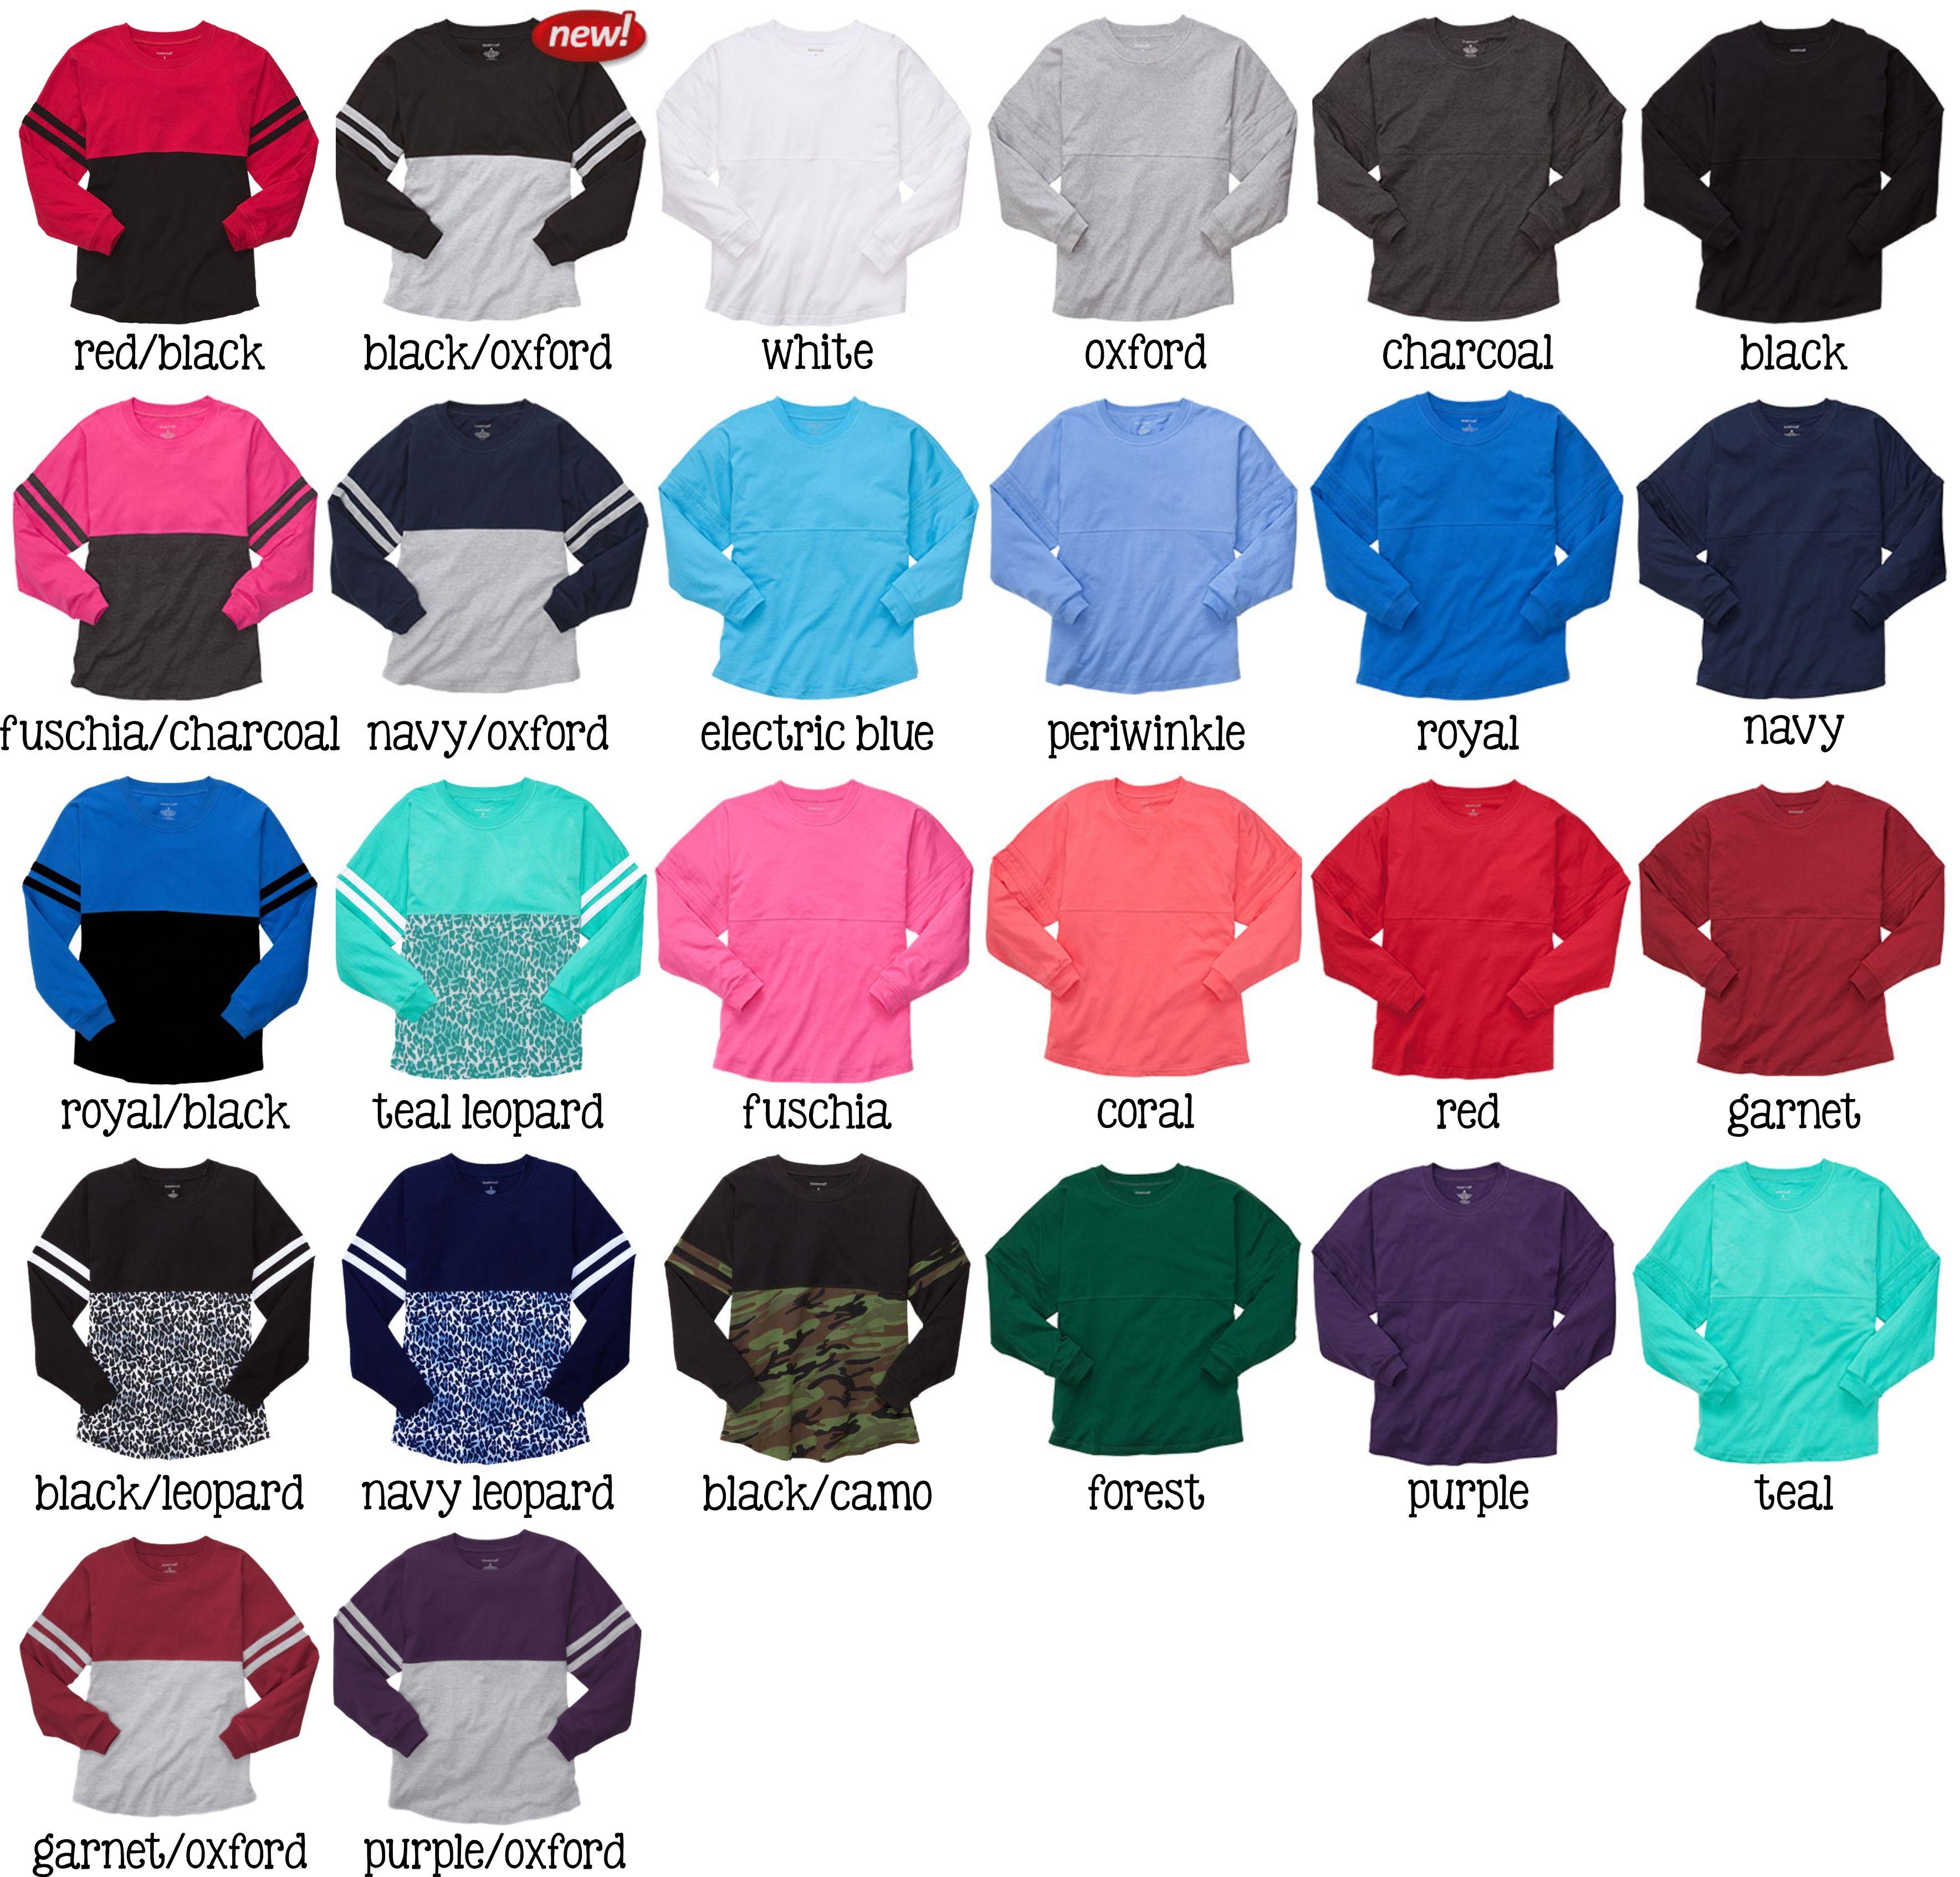 842221f83 Boxercraft Spirit Jersey - Pom Pom Youth Pom Pom Shirts, Wholesale Crafts,  Buying Wholesale